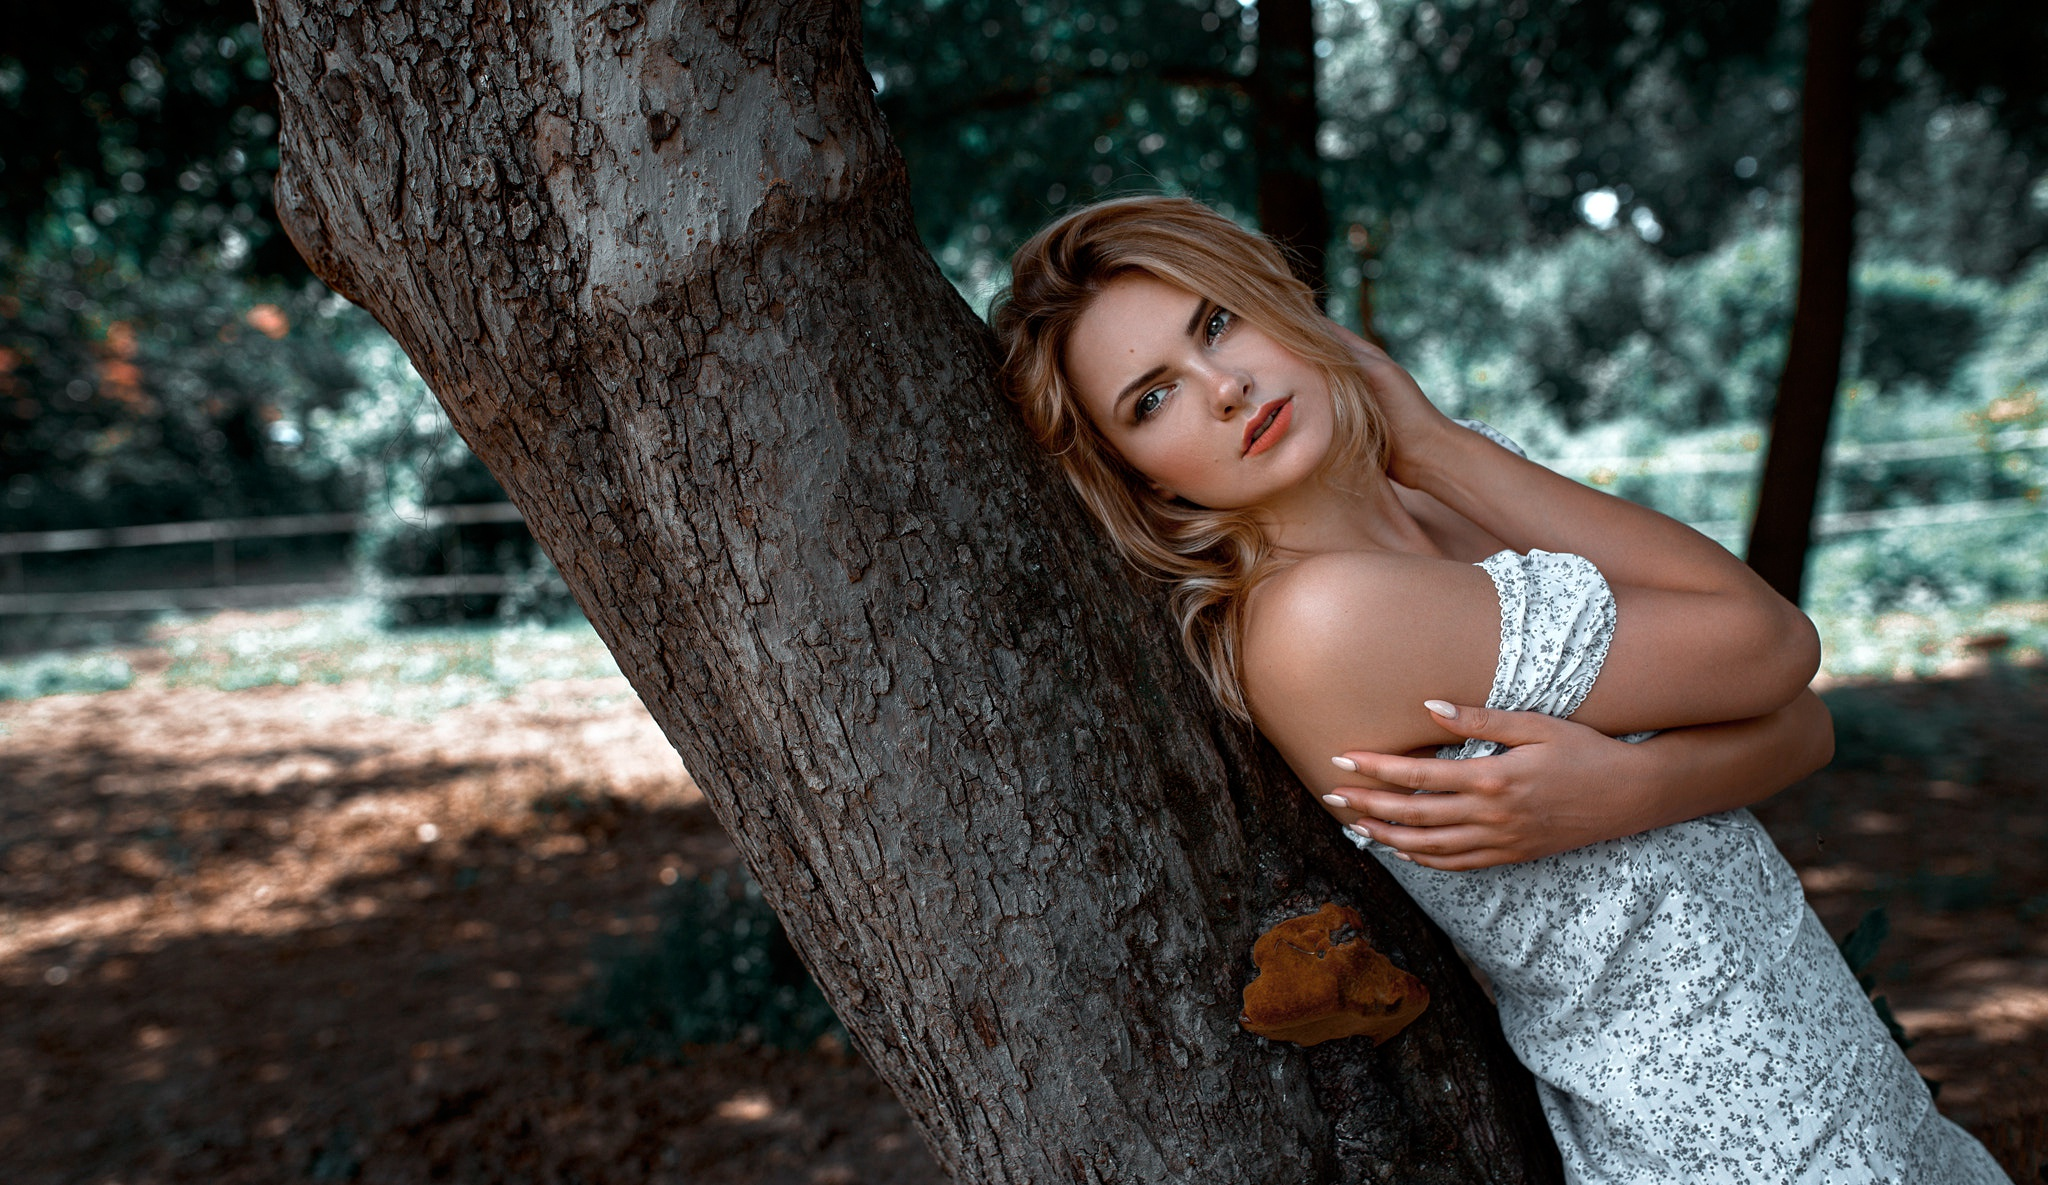 https://img4.goodfon.ru/original/2048x1185/c/1b/damian-piorko-carla-sonre-krasotka-blondinka-model-stoit-u-d.jpg